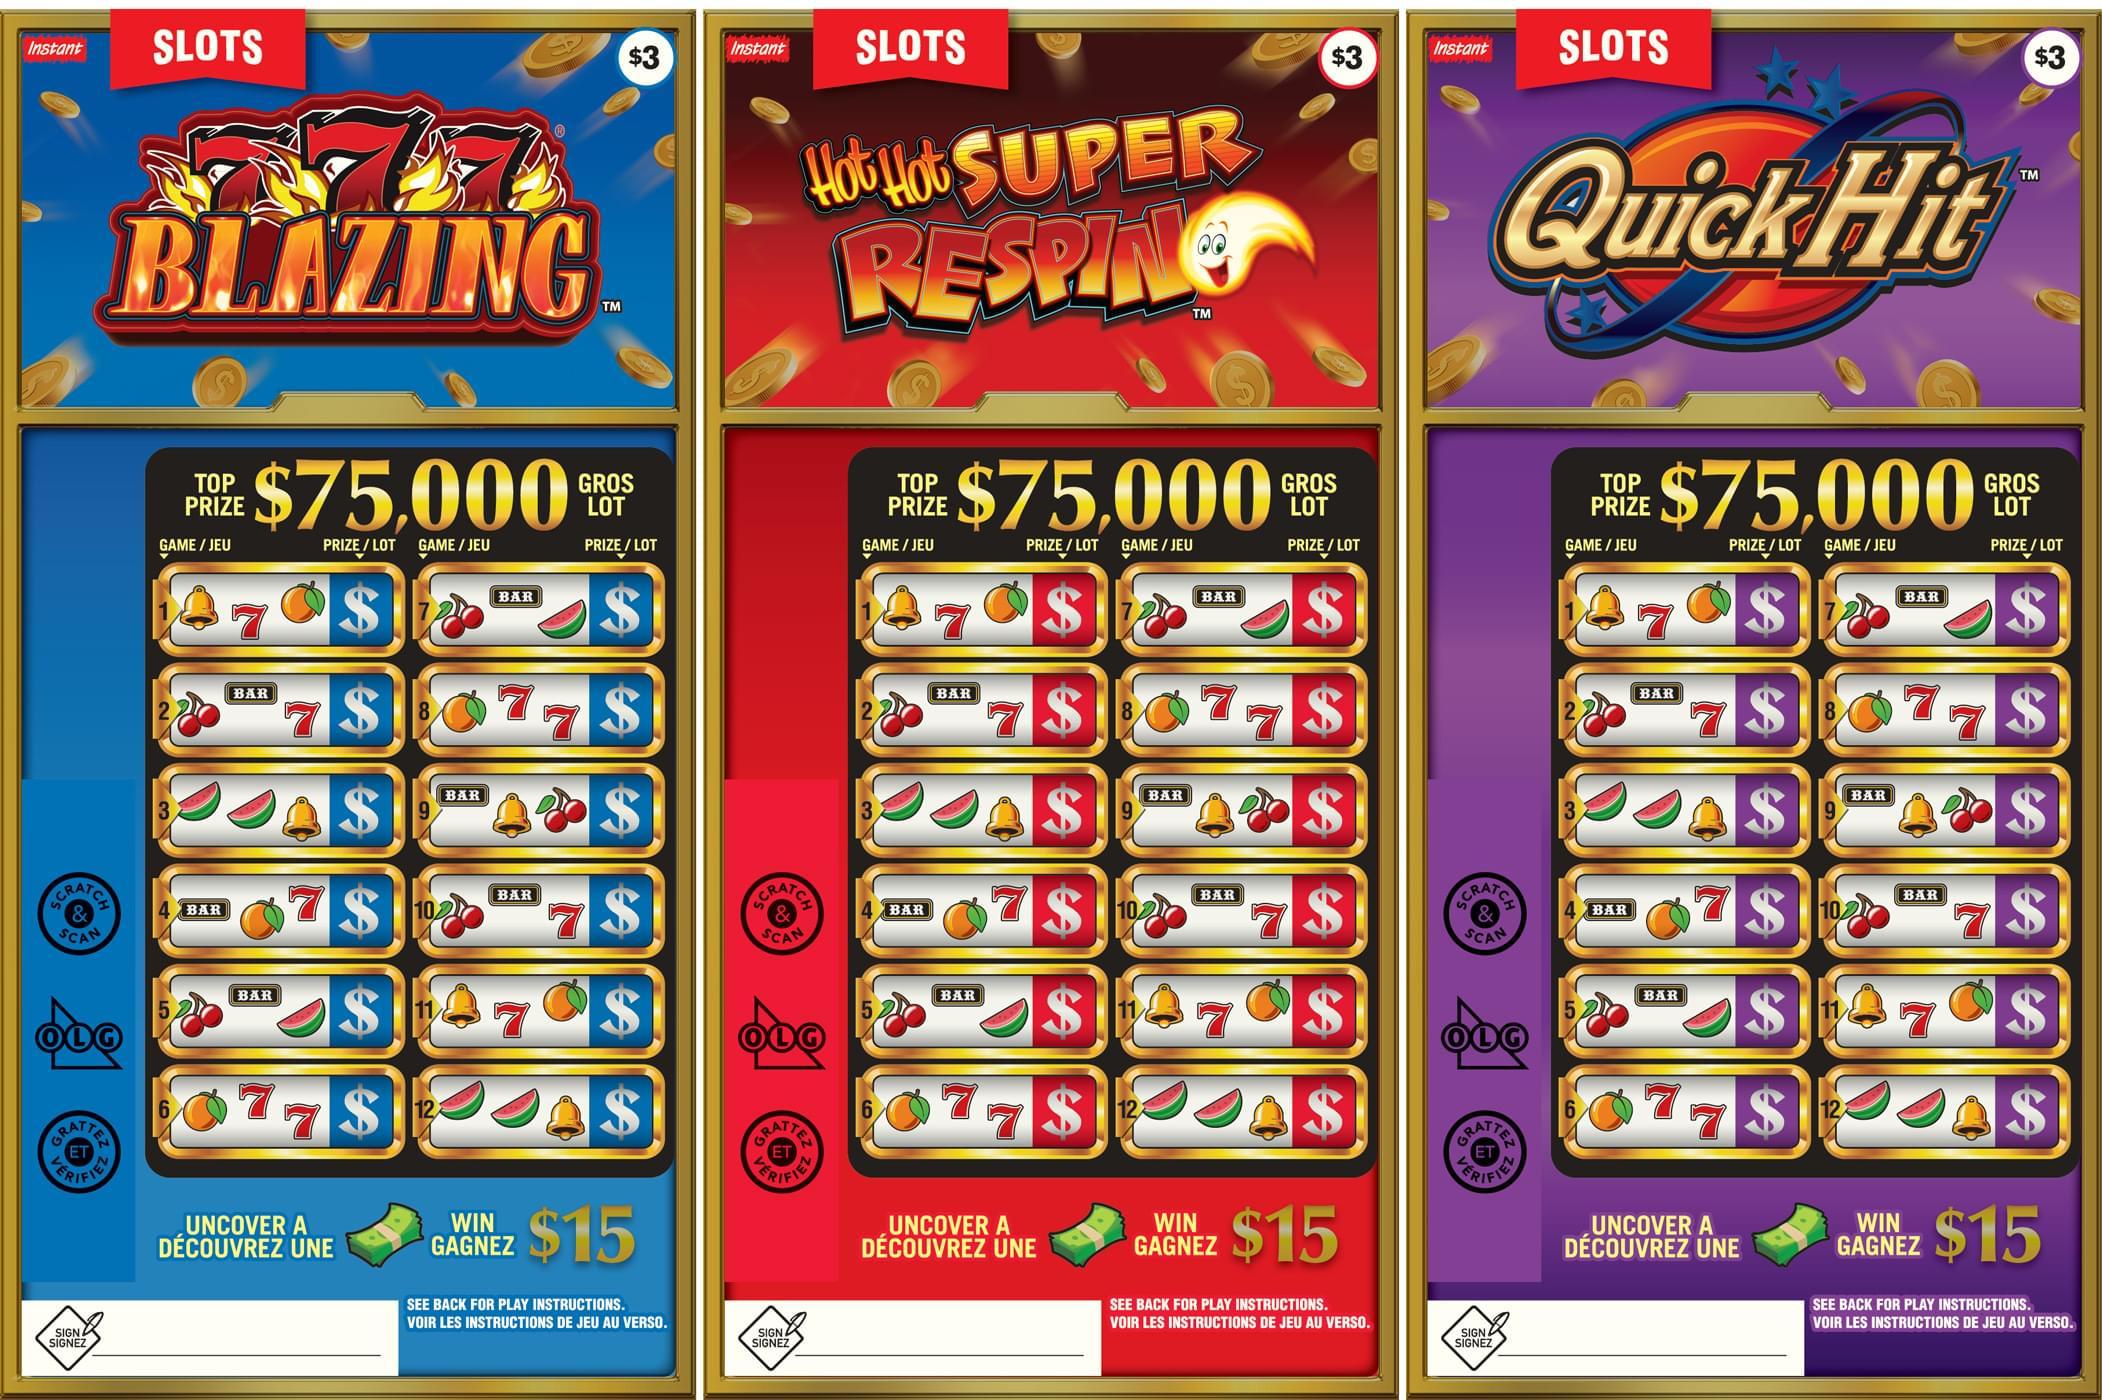 Slots tickets